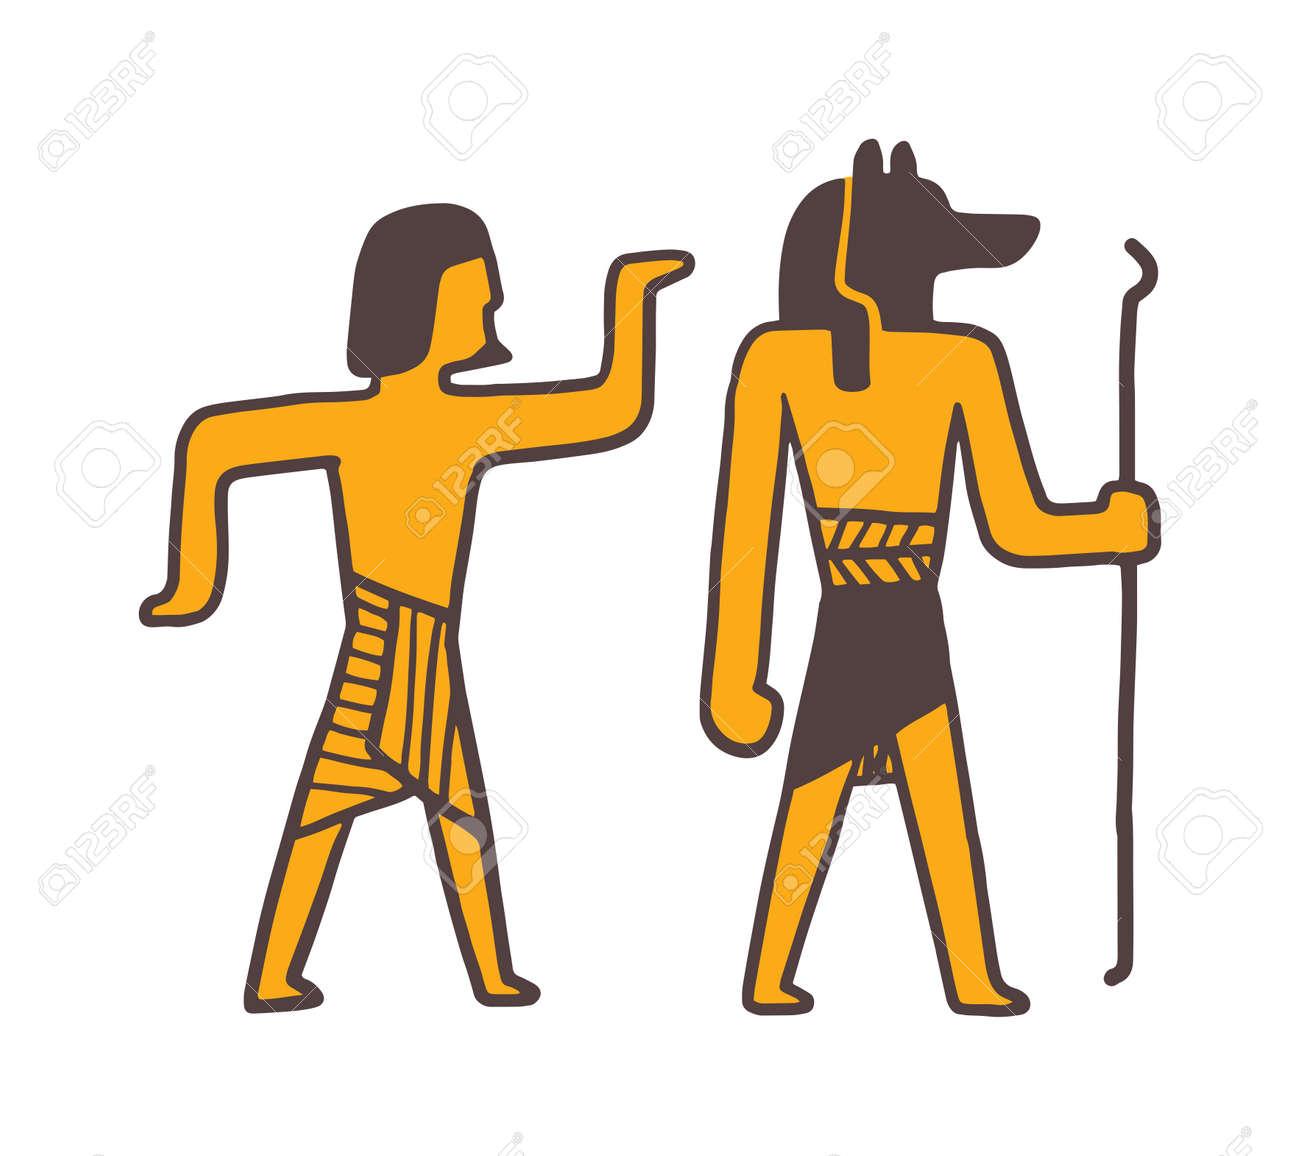 Egypt people vector  Illustration of Egypt people zodiac sign